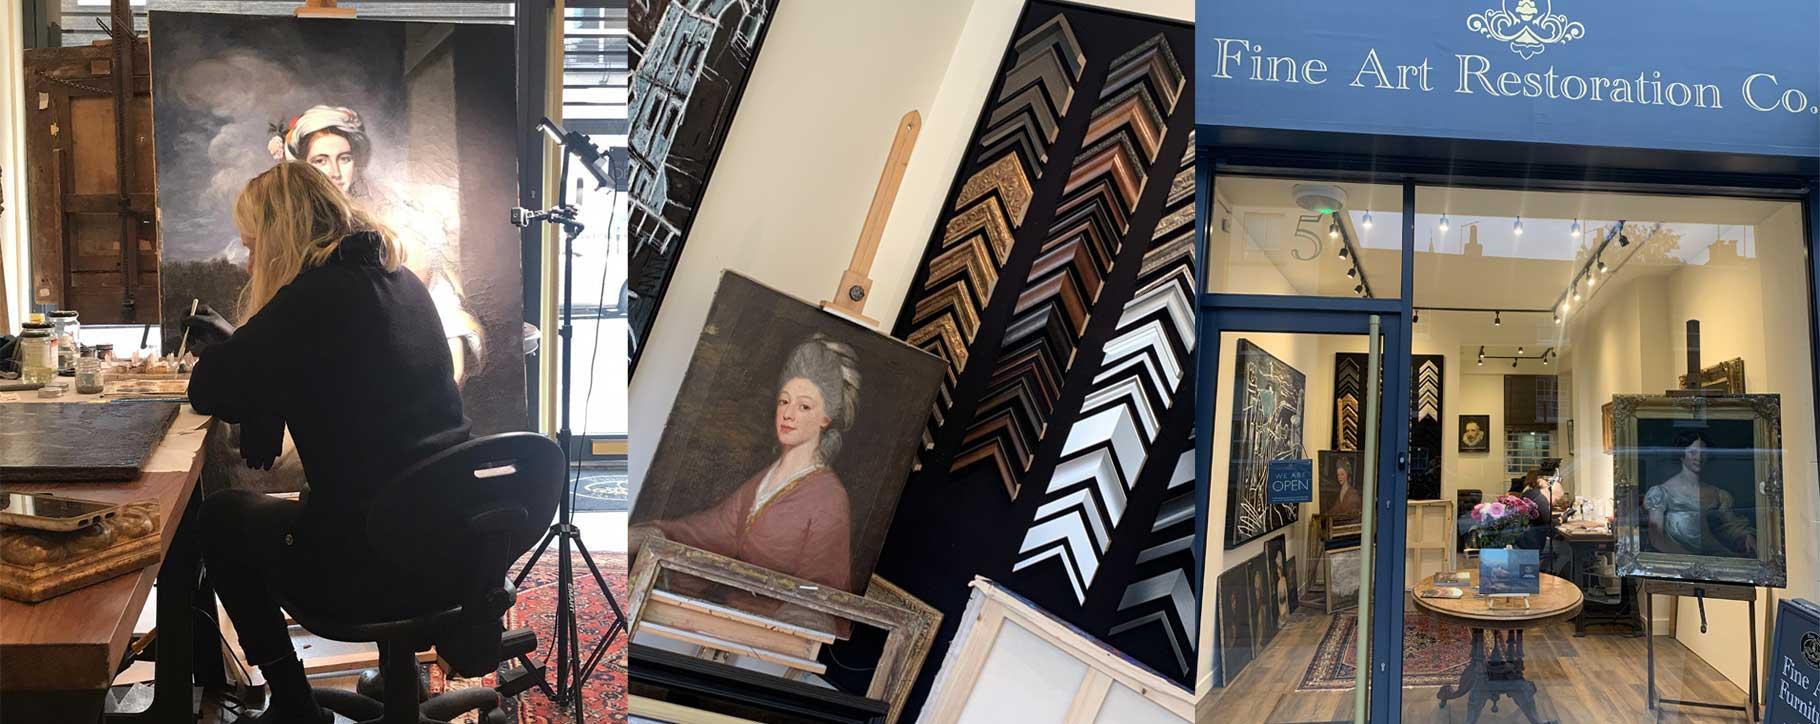 fine art restoration company london shop